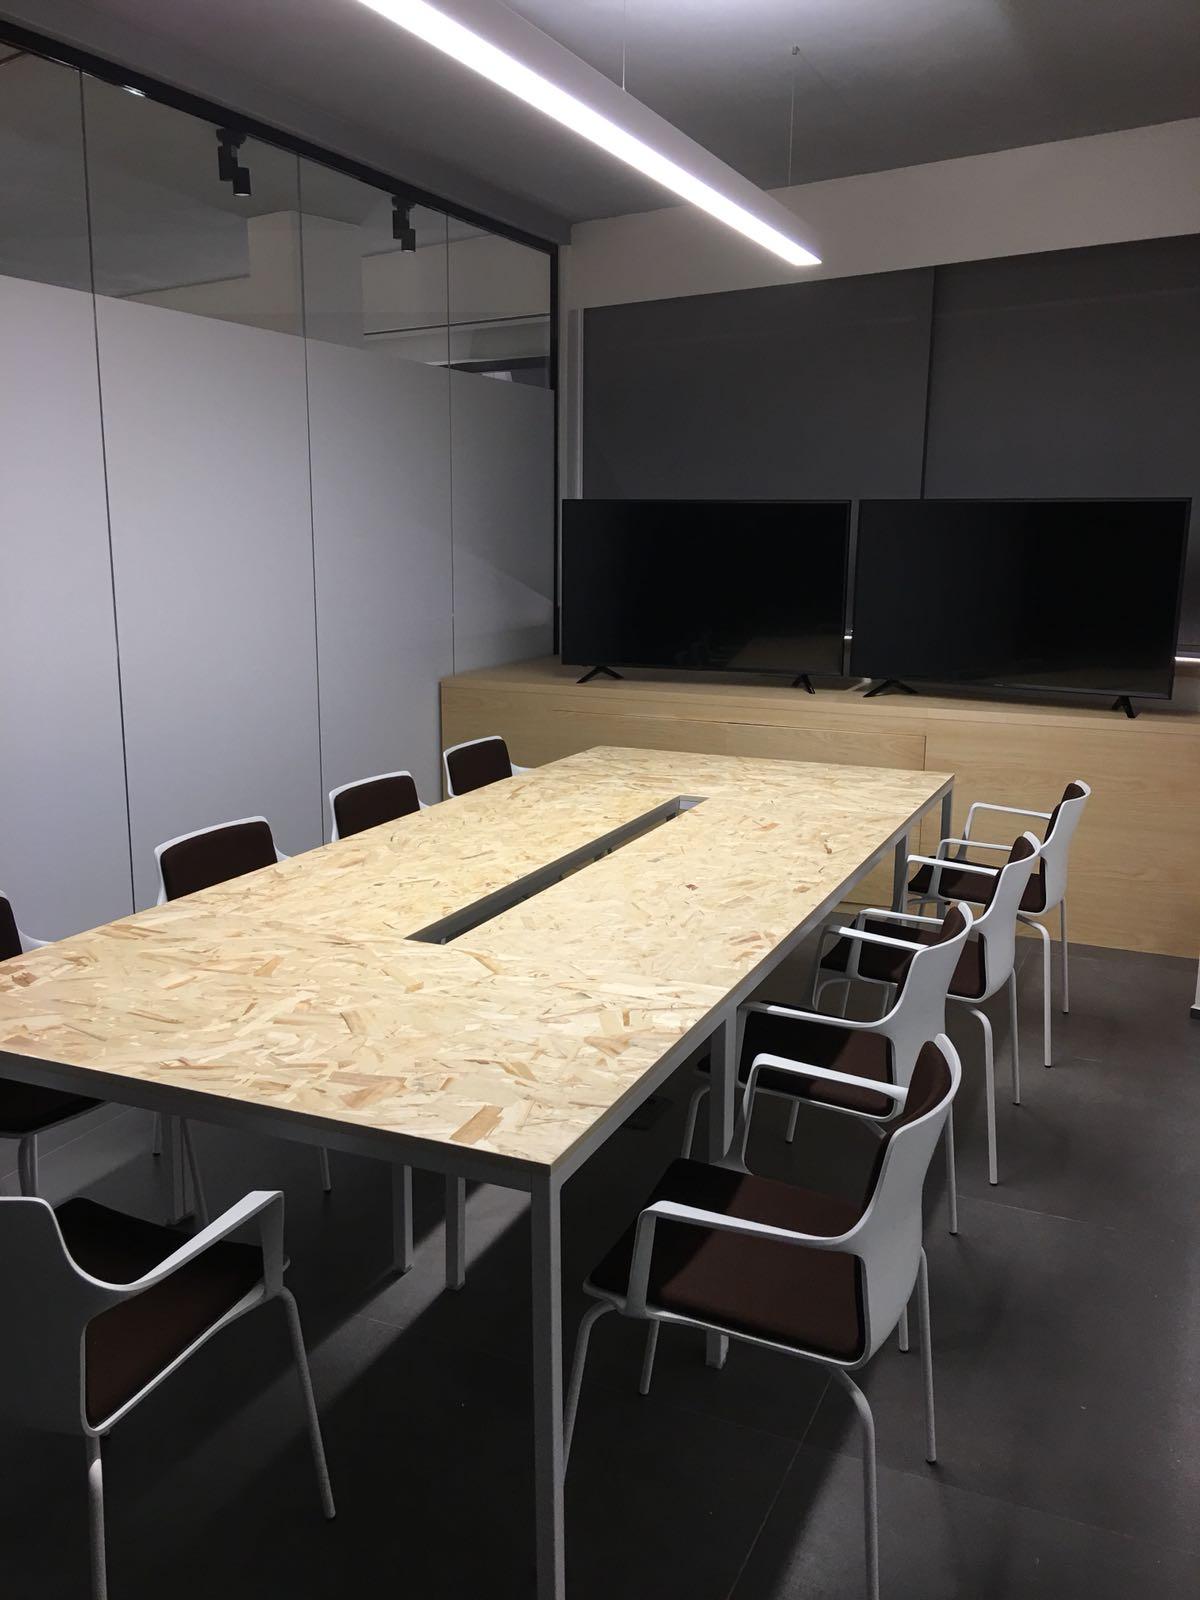 IBCenter Happy Working, Business Center, Uffici arredati a tempo, Coworking , Sale Meeting.